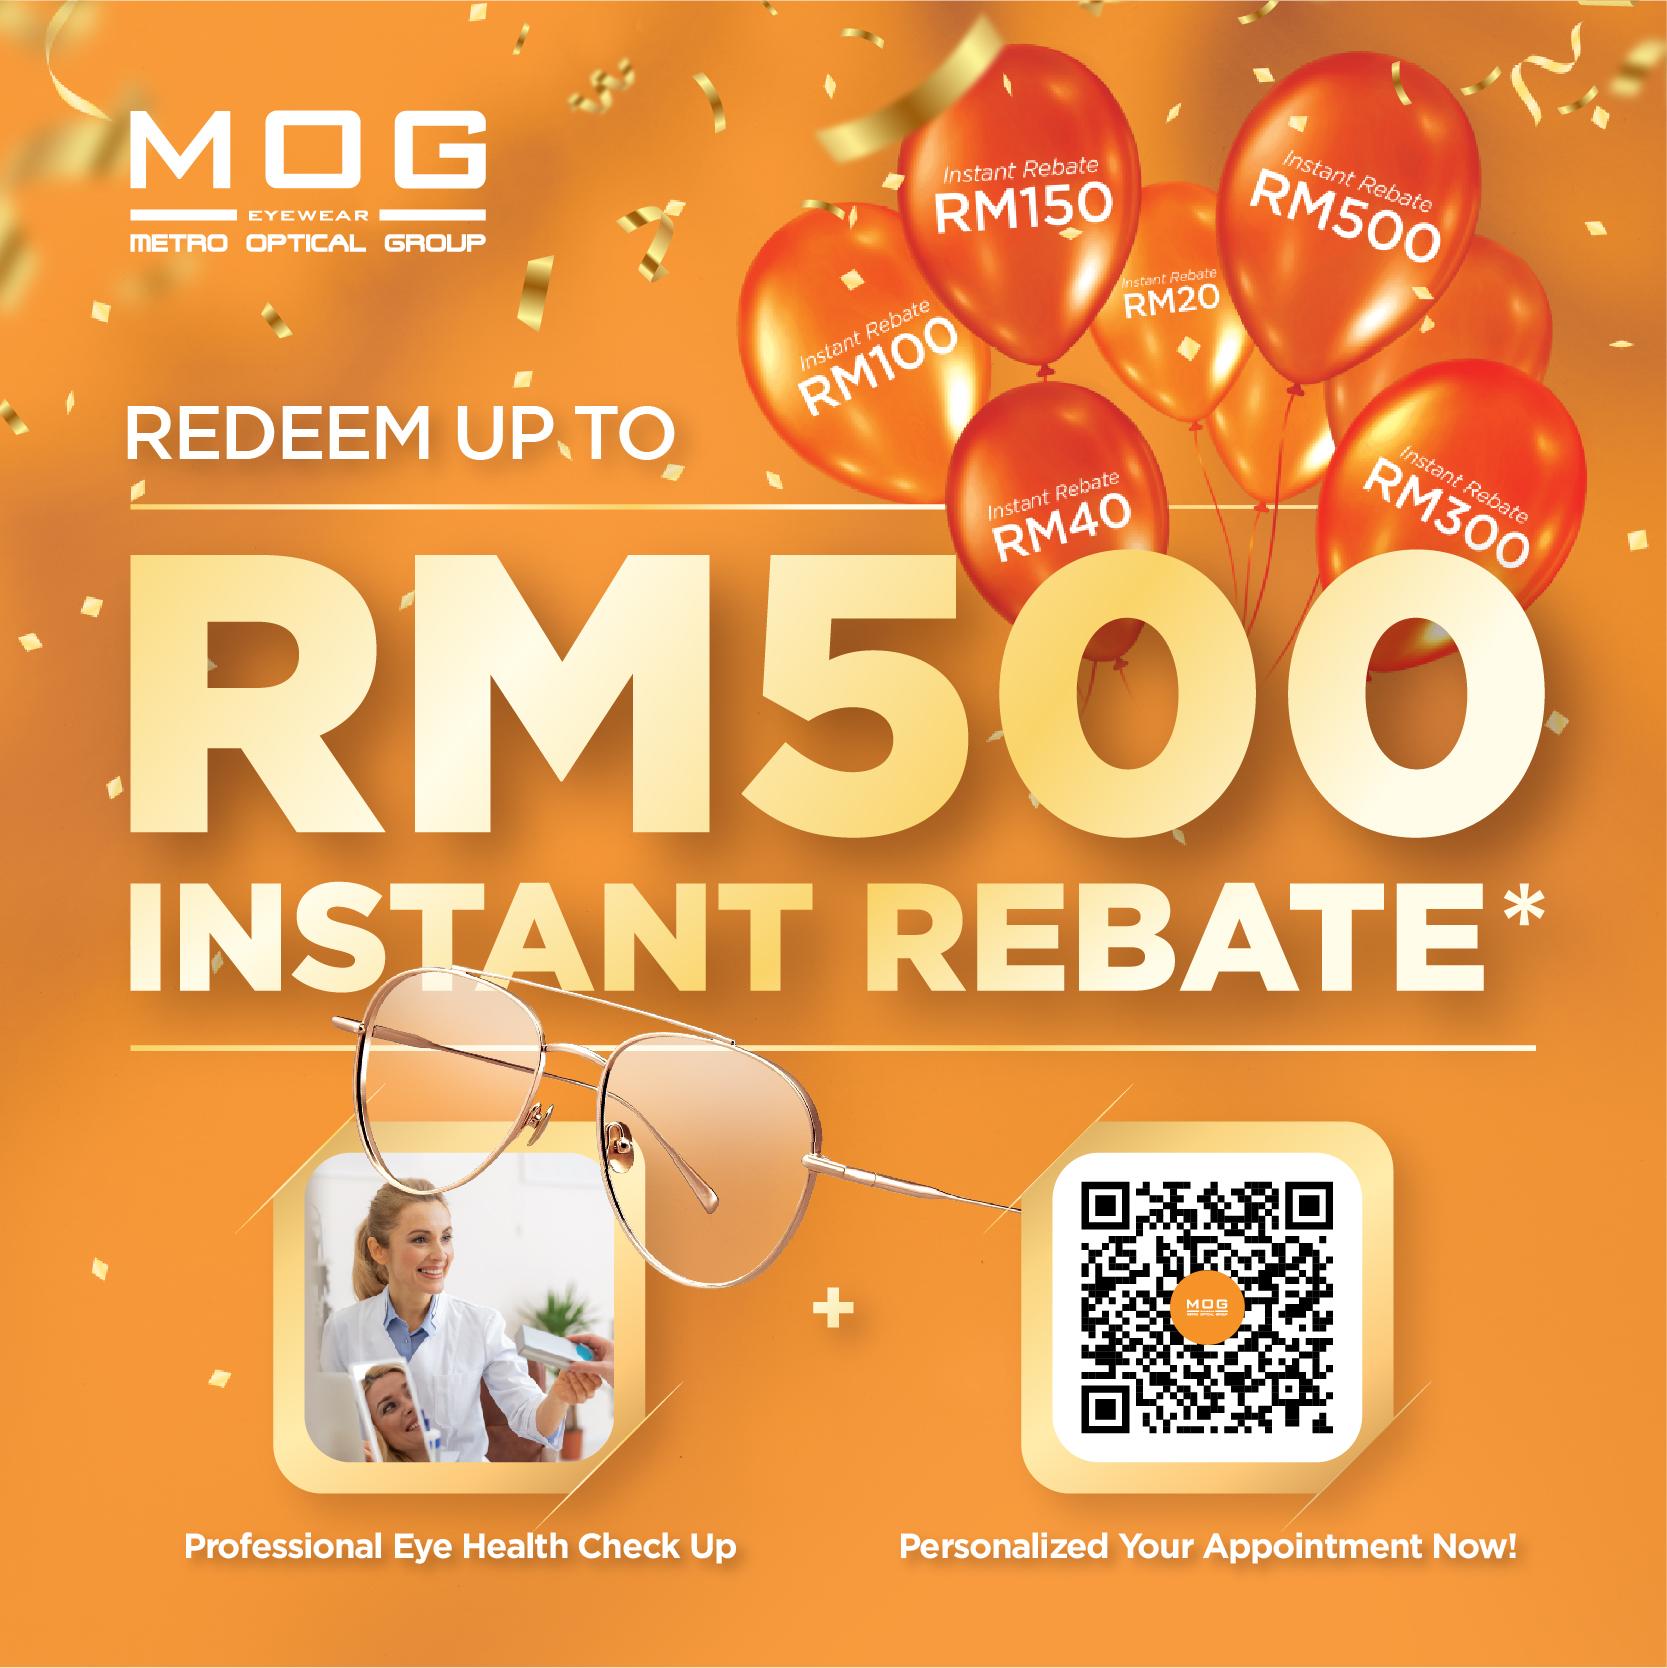 MOG Anniversary: Instant Rebate